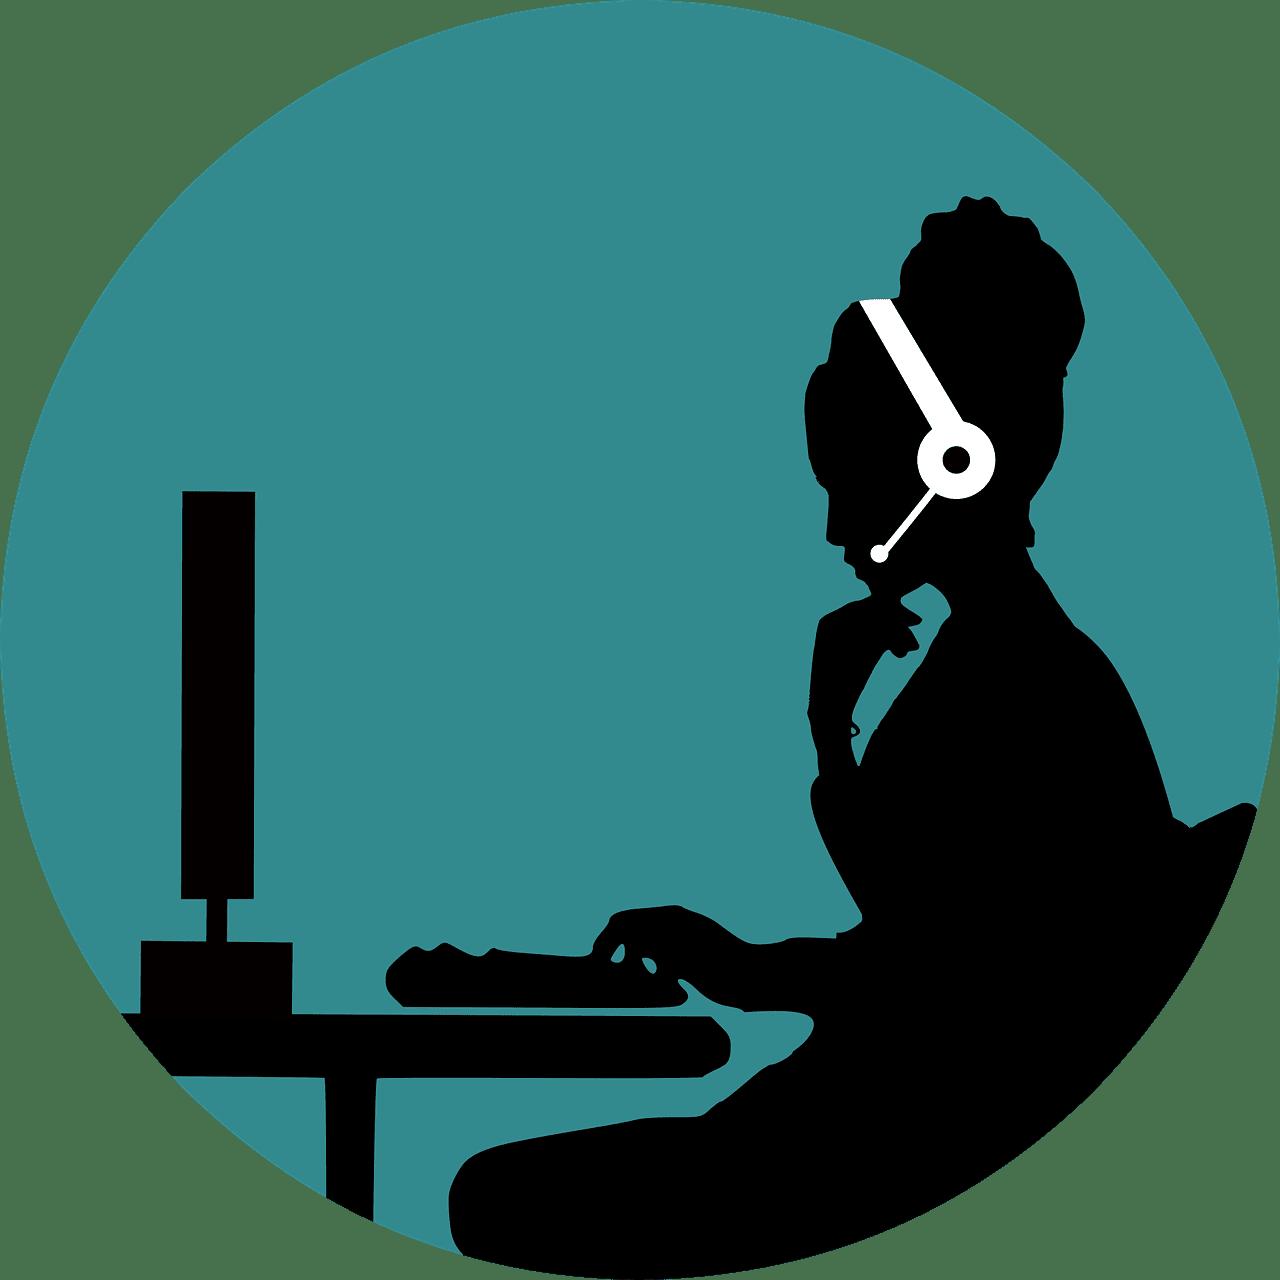 Good Customer Service - Answering Service